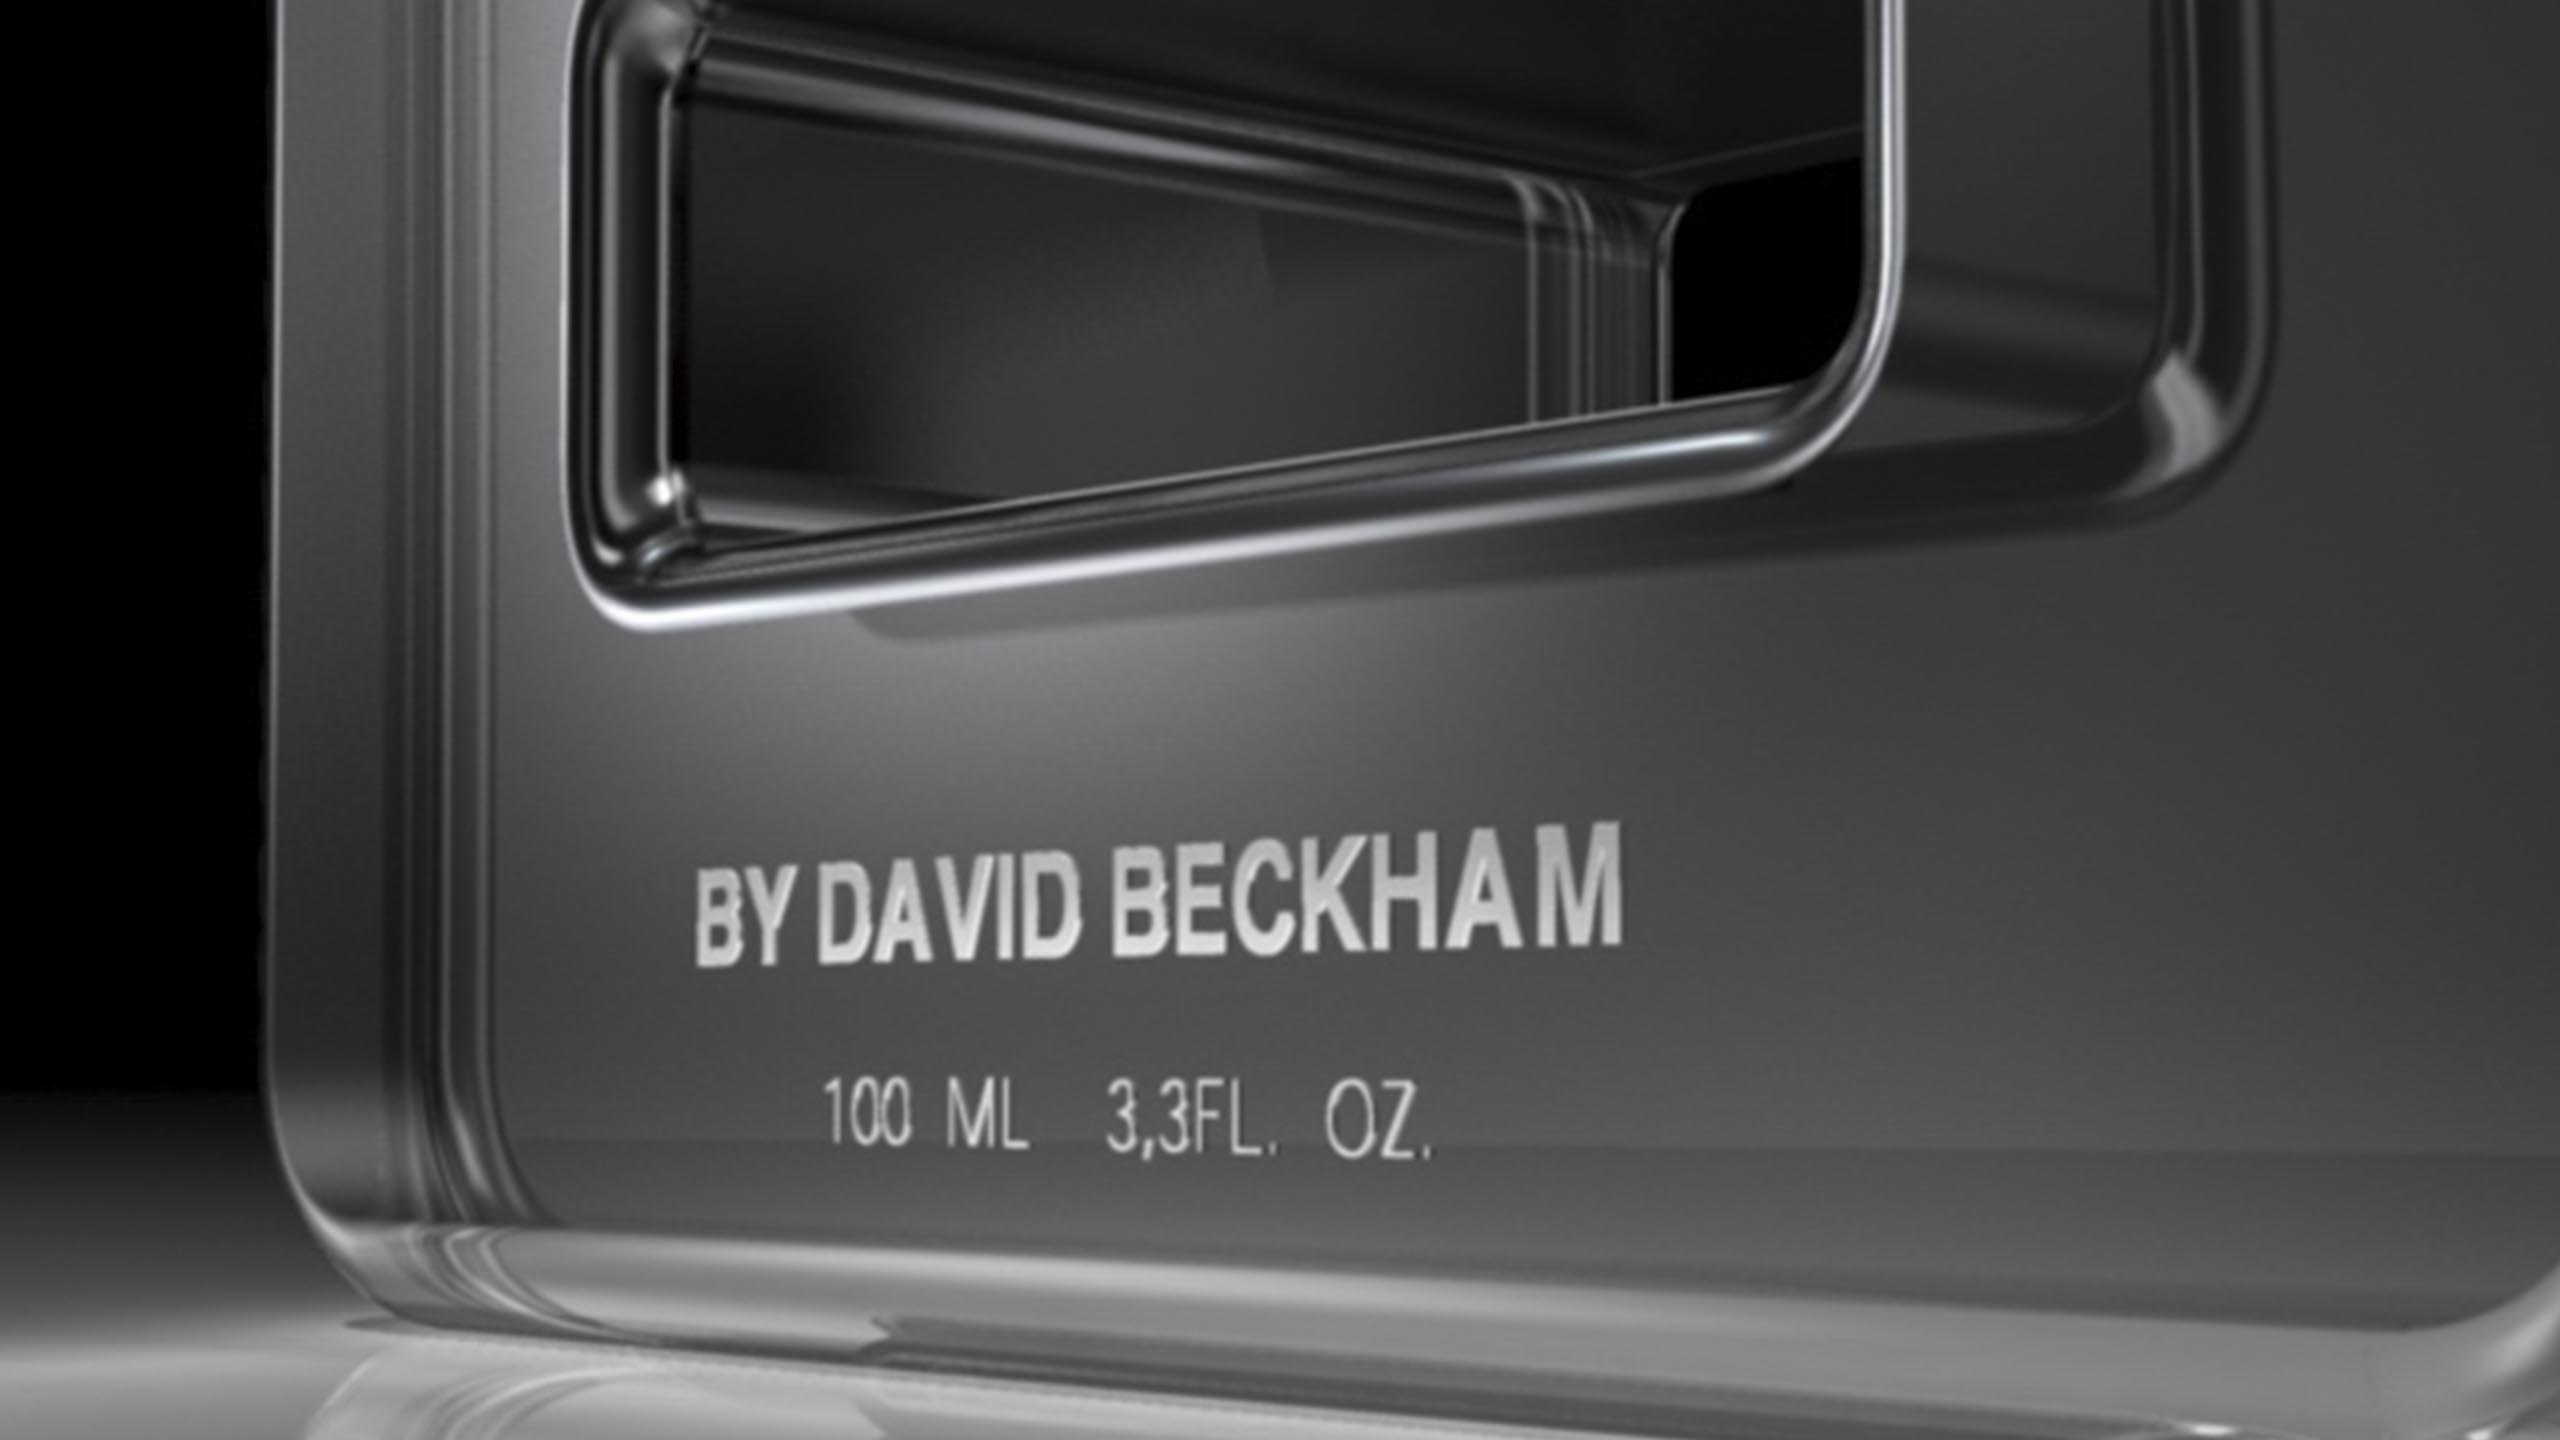 David Beckham fragrance